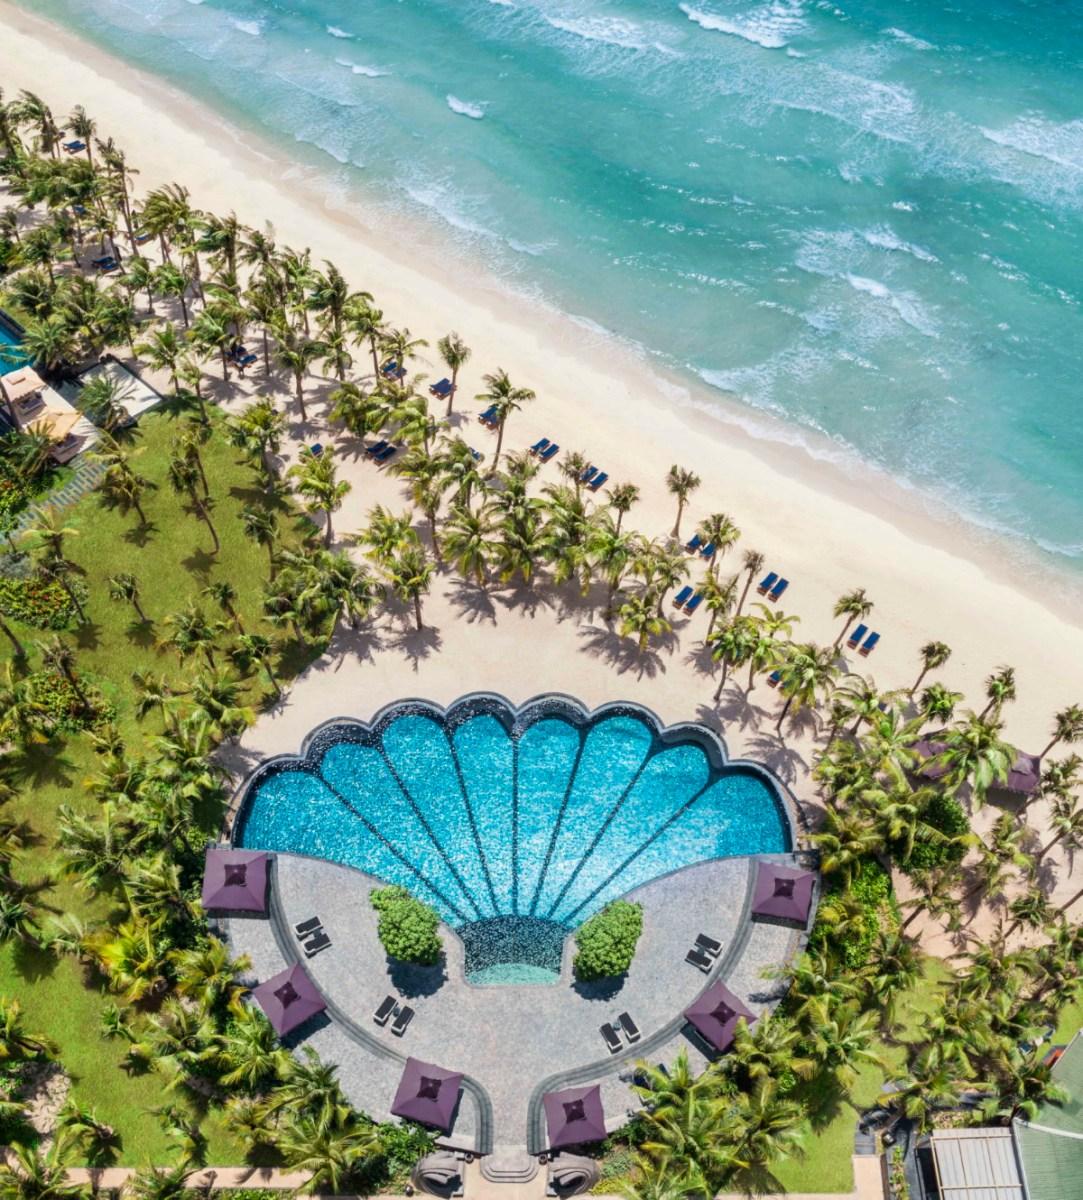 JW Marriott Phu Quoc Emerald Bay Celebrates Second Anniversary